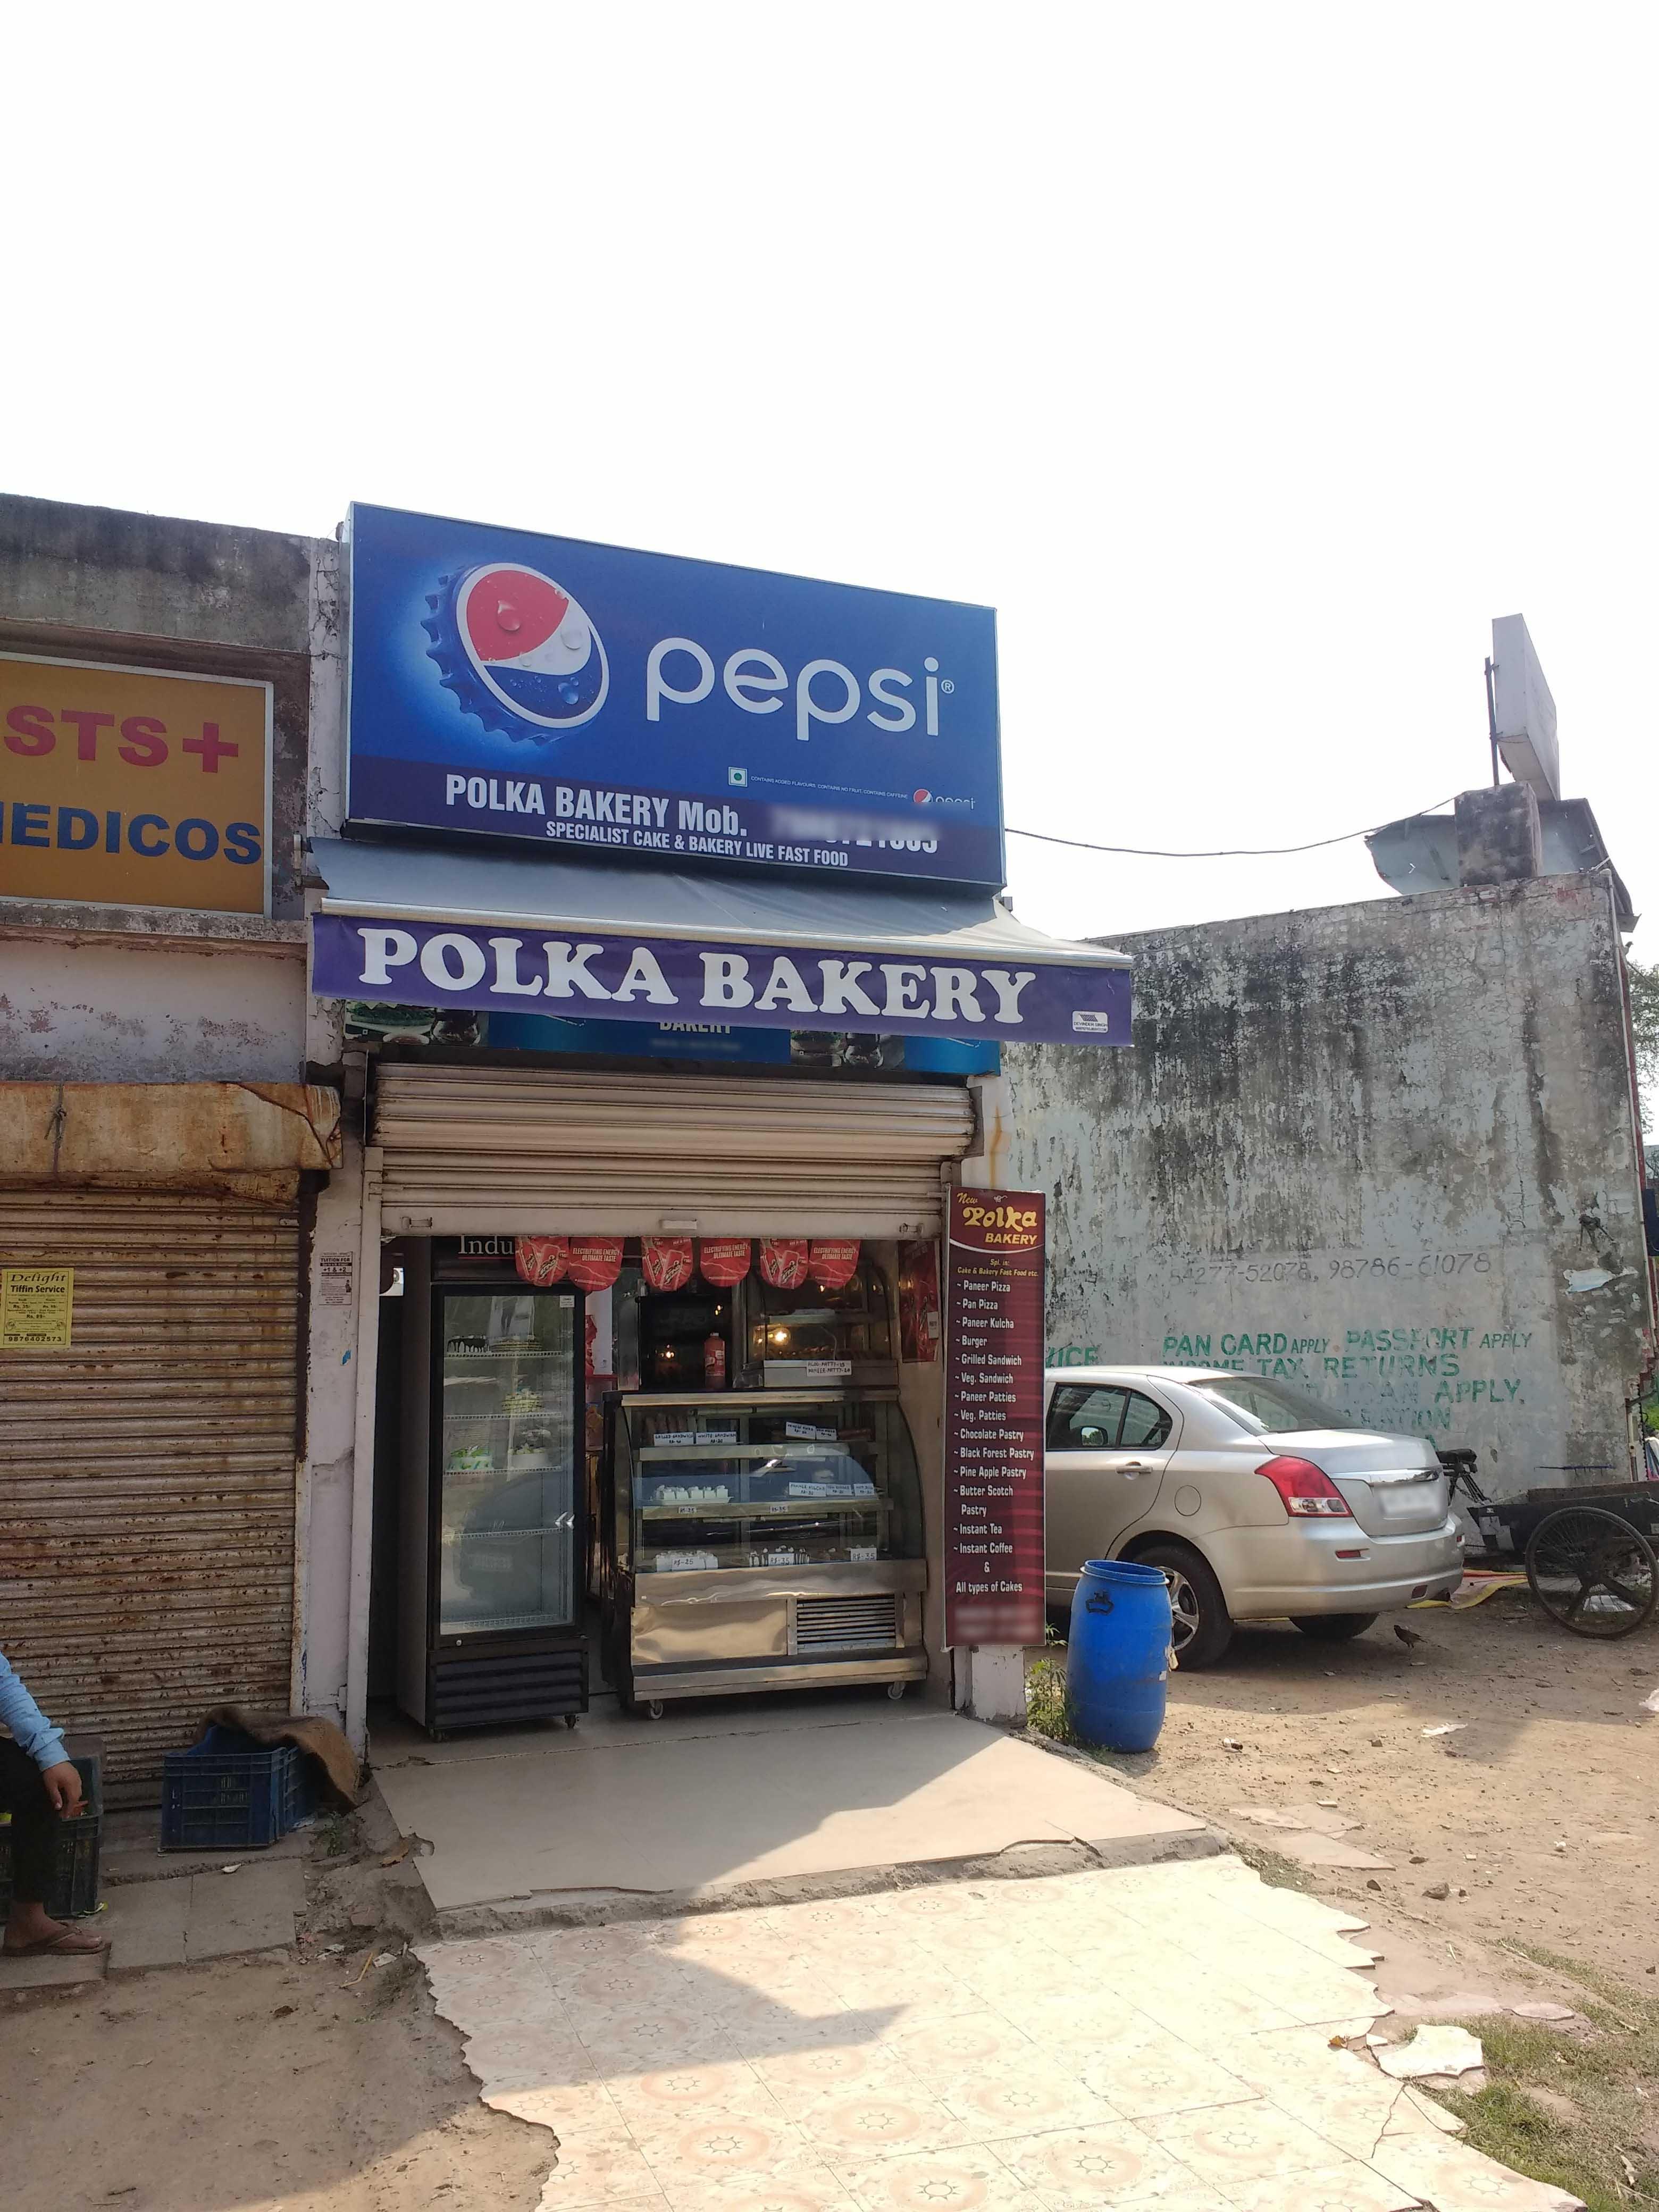 New Polka Bakery - Sector 70 - Mohali Image